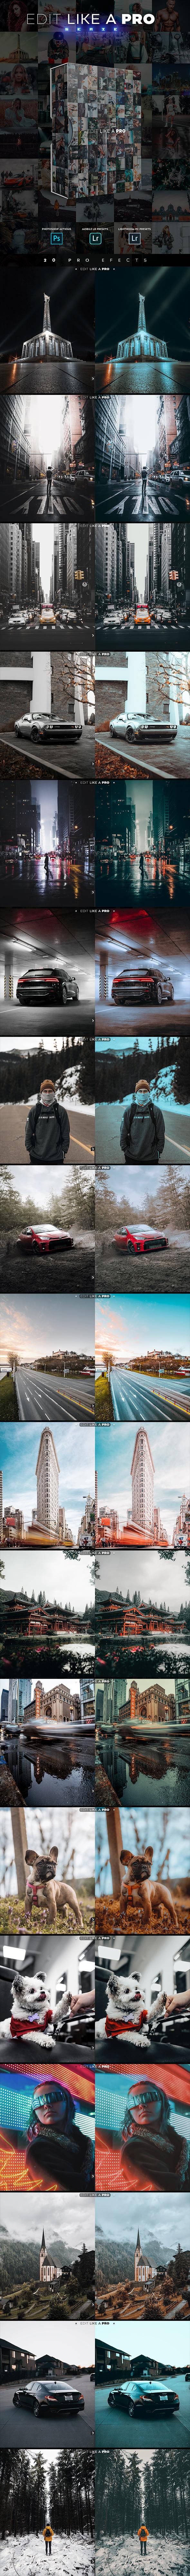 Edit Like A Pro Serie - Photoshop & Lightroom Effects